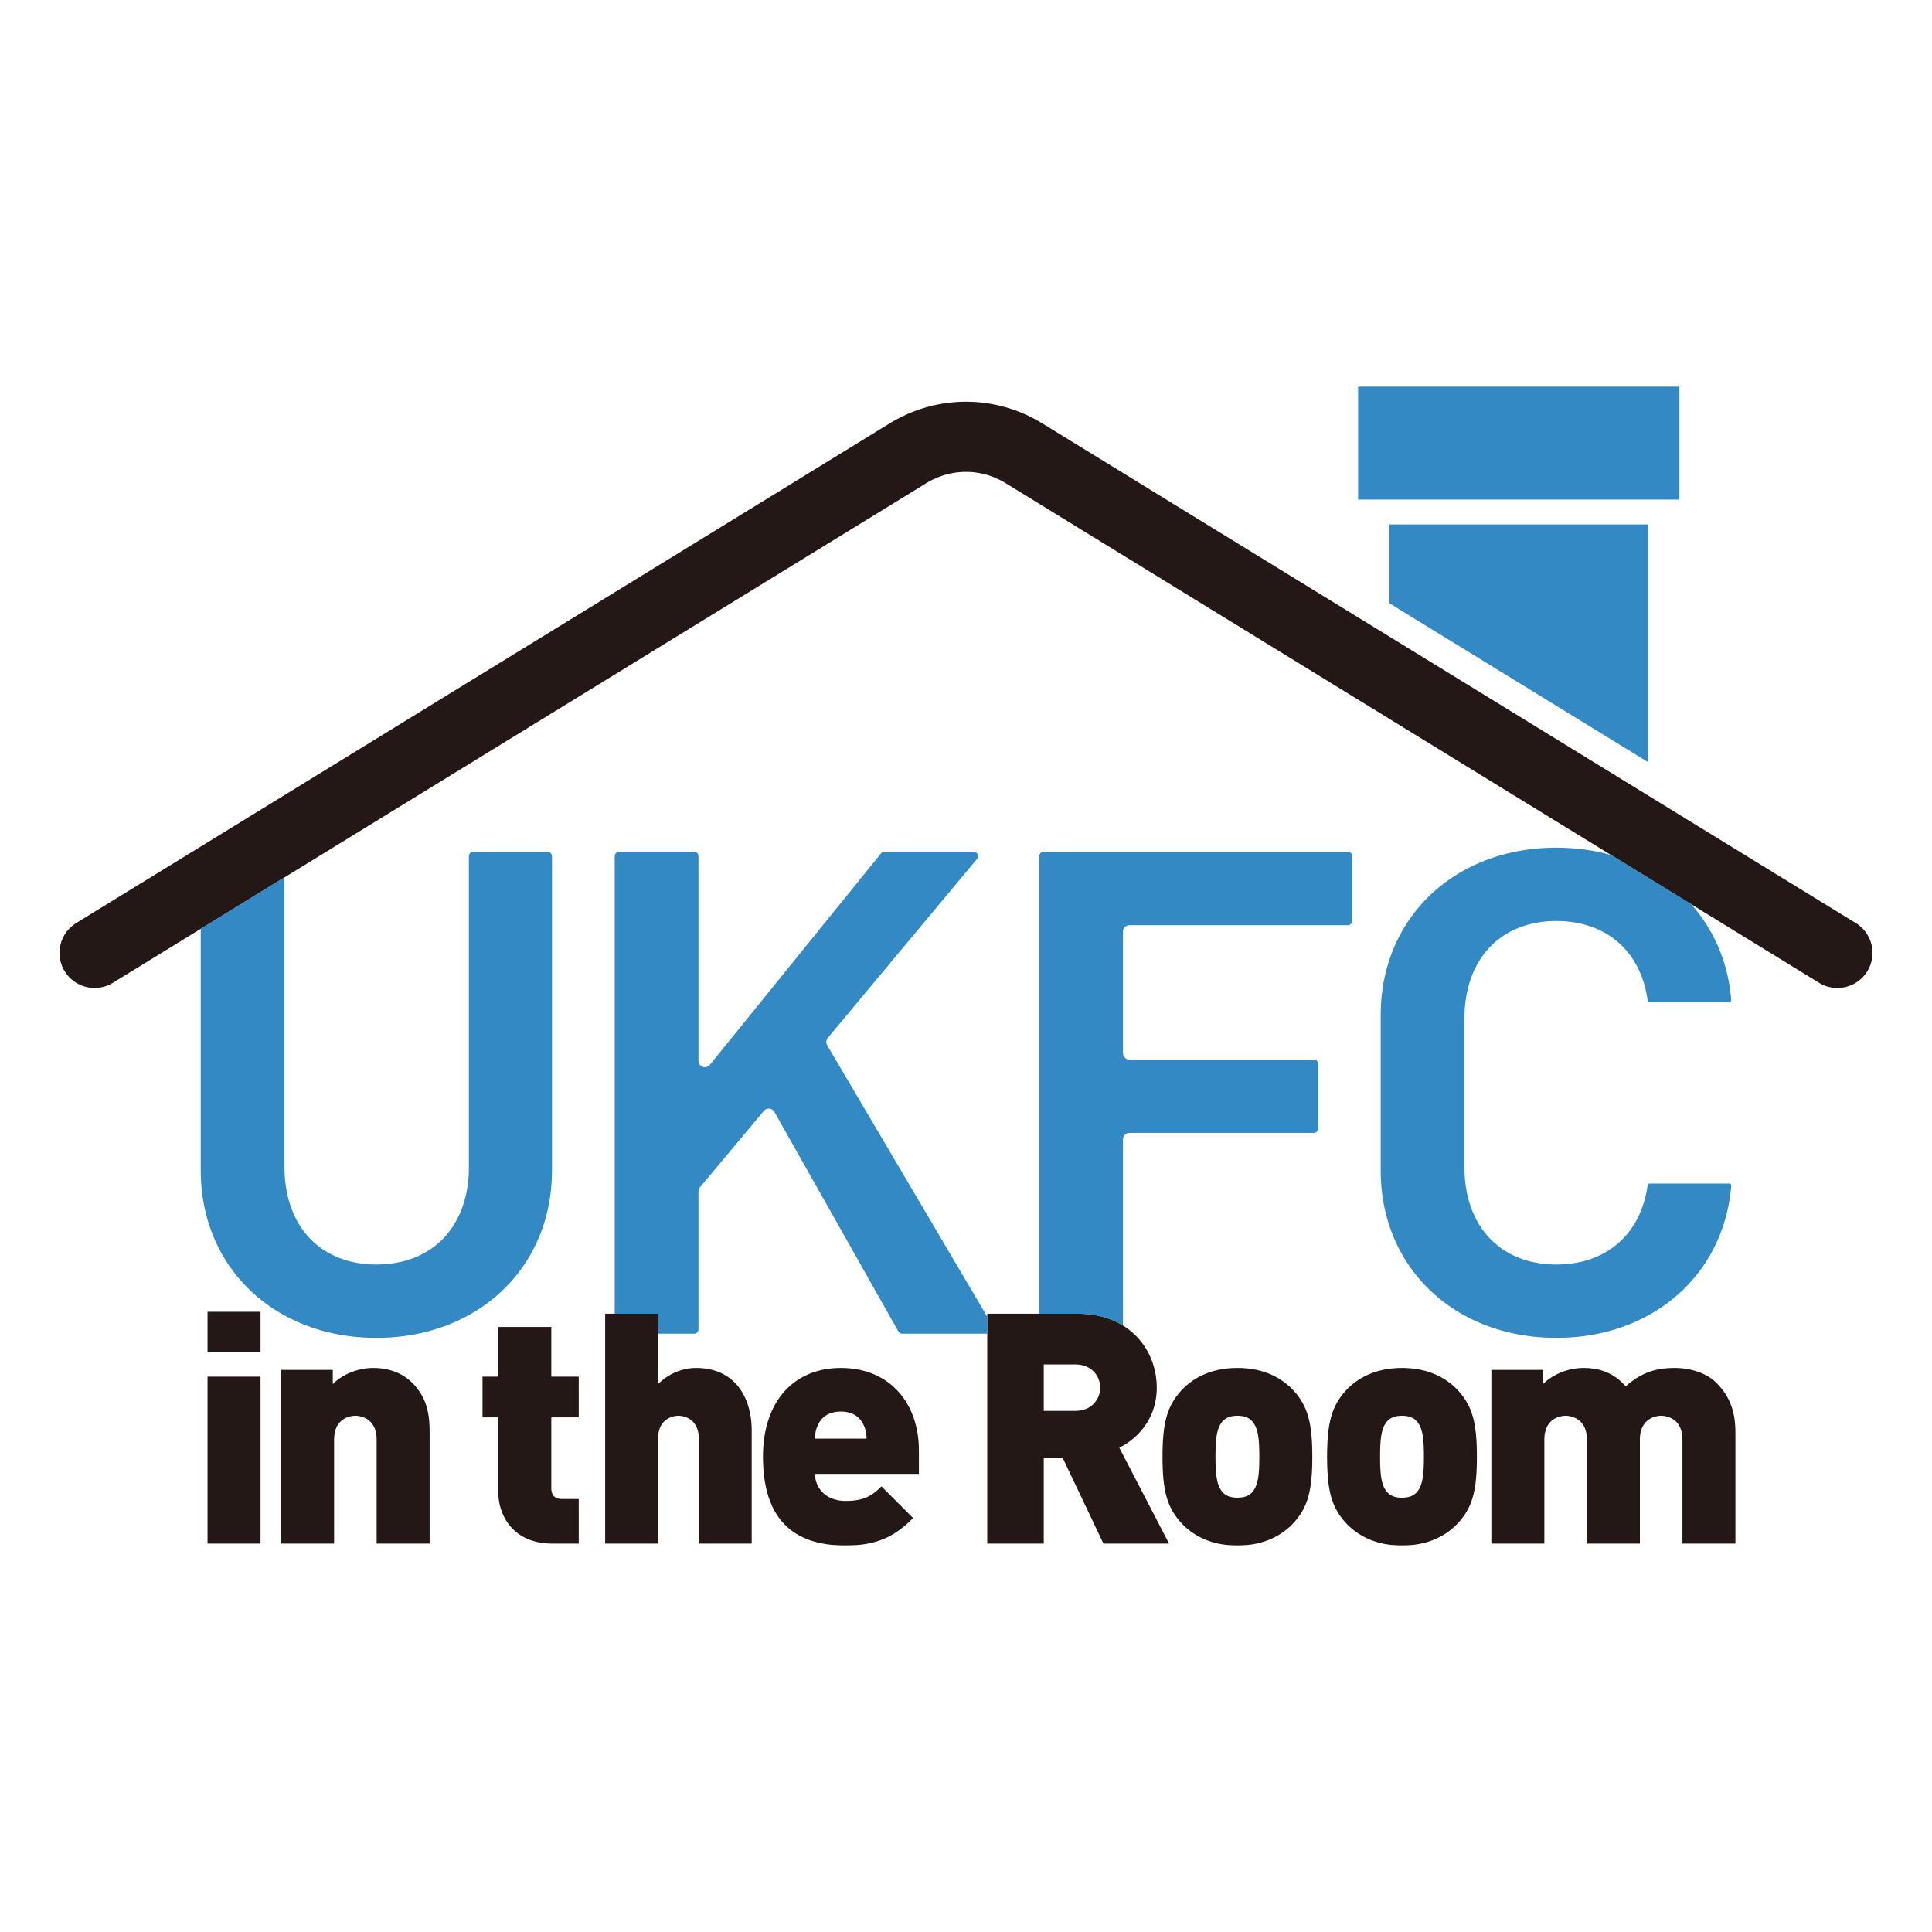 UKFCintheroom_logo.jpg